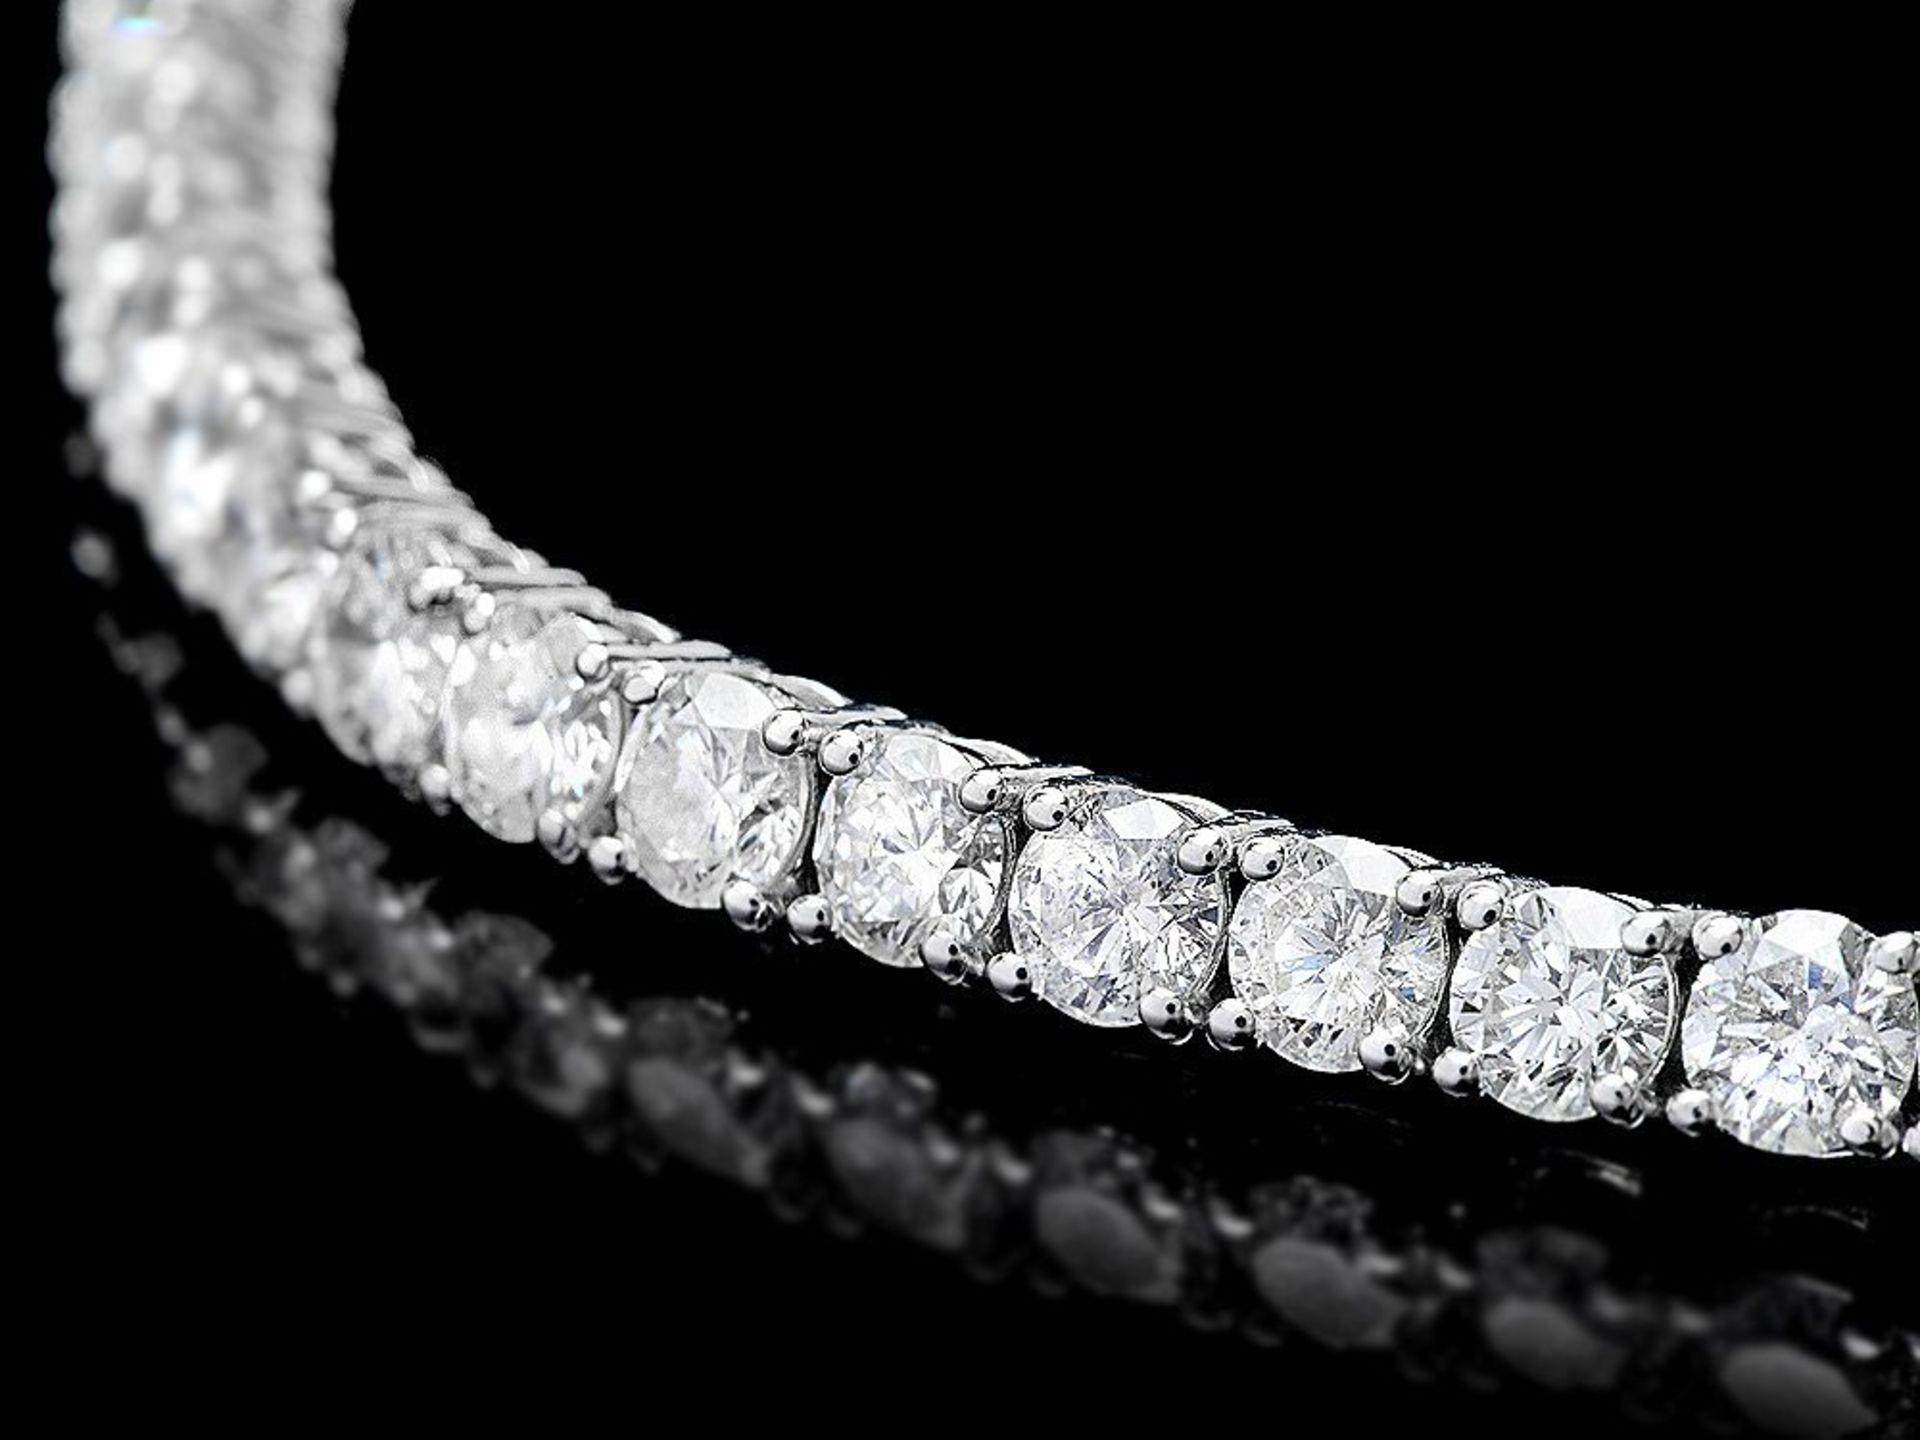 18k White Gold 8.00ct Diamond Bracelet - Image 2 of 4